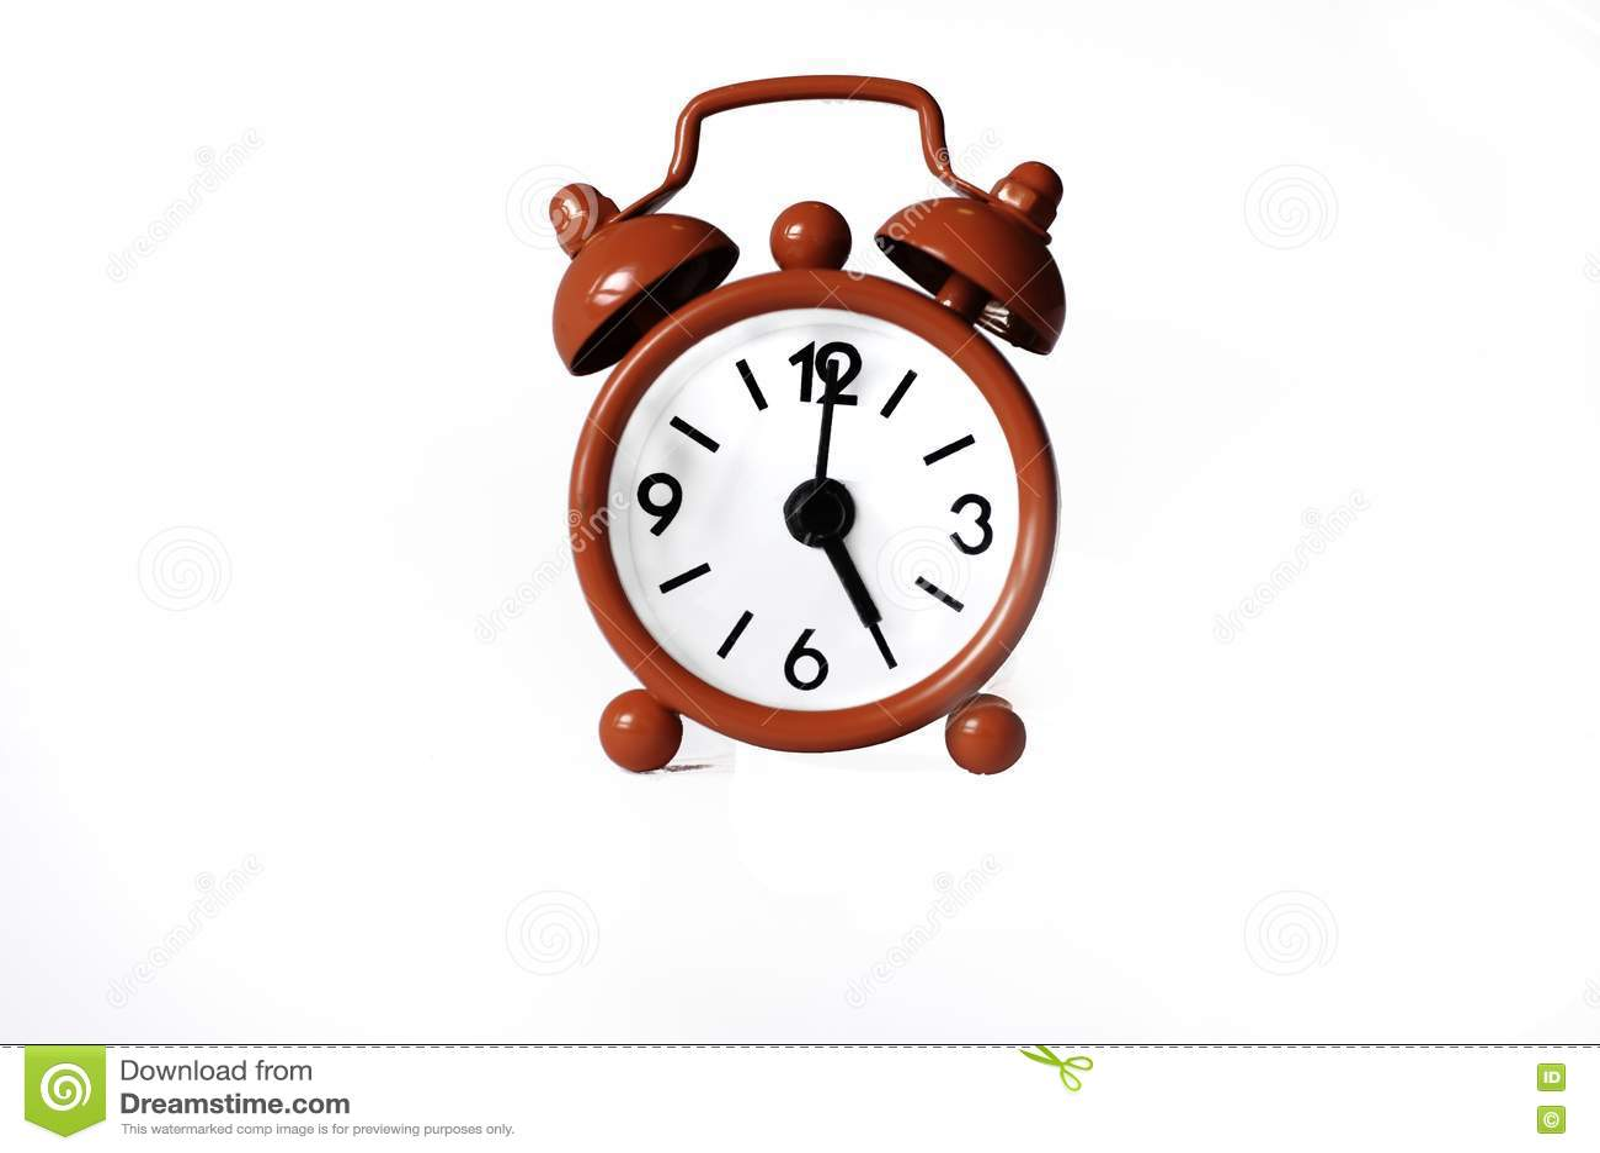 Cute Clock Royalty Free Stock Photos Image 17414248